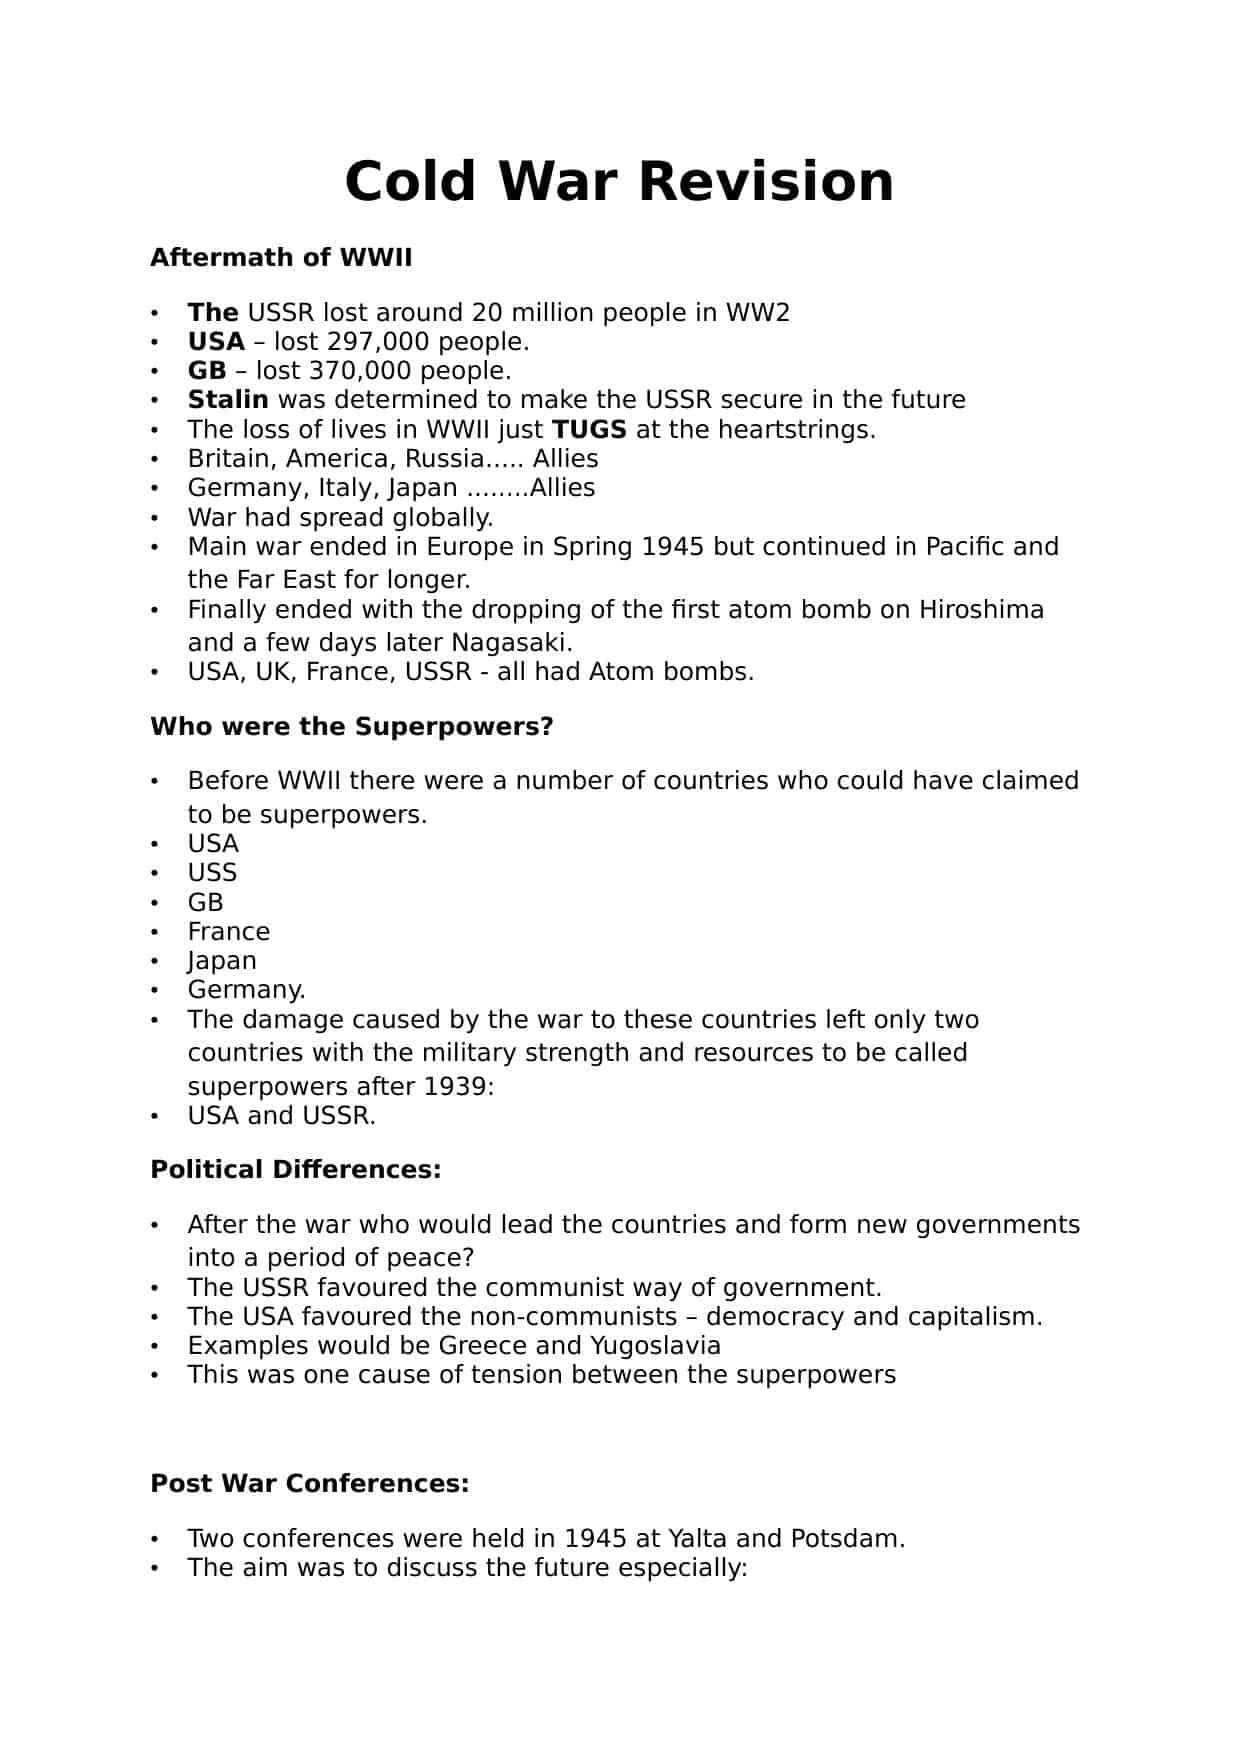 Igcse Cold War Revision Notes